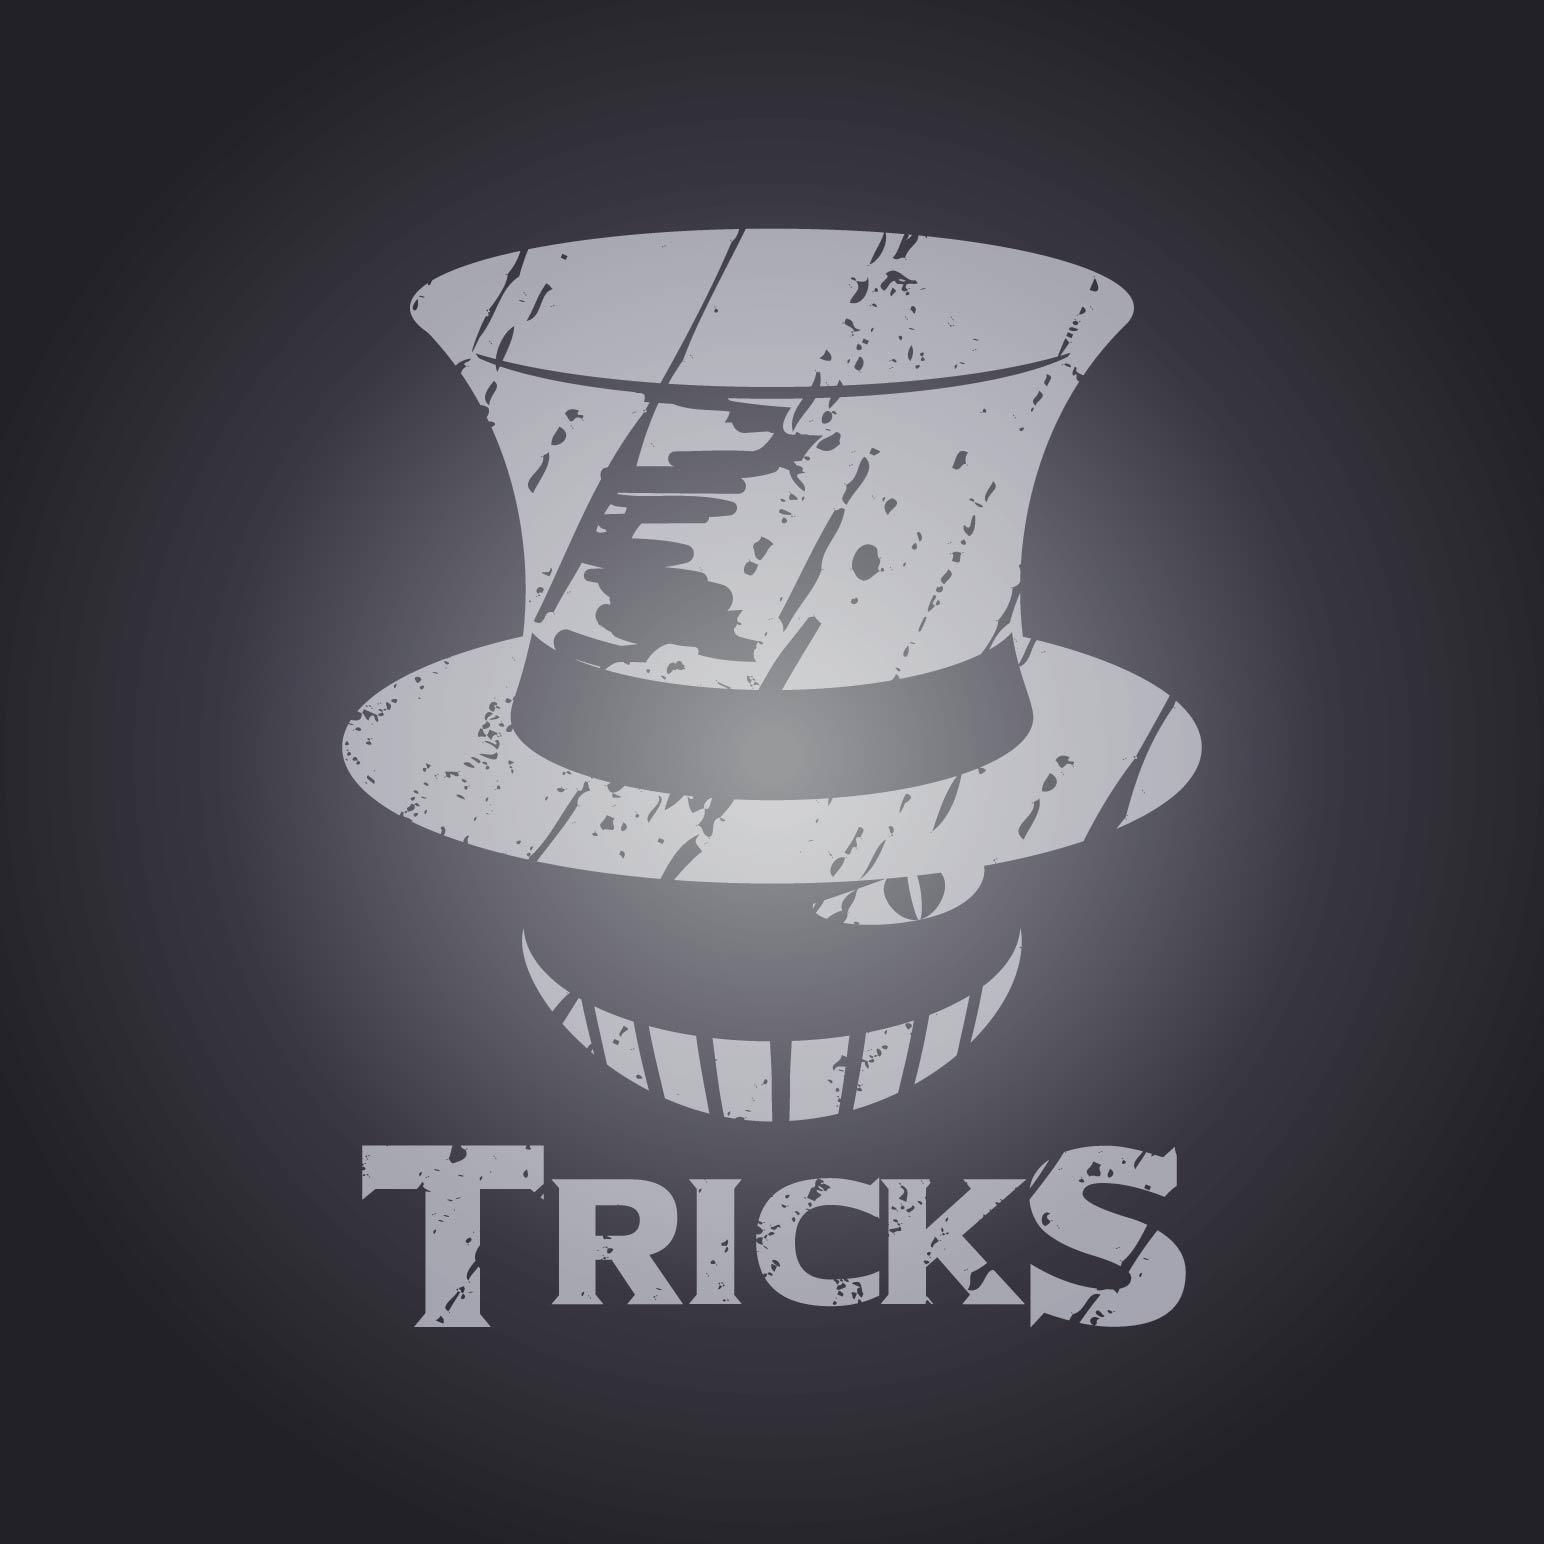 Tricks logo